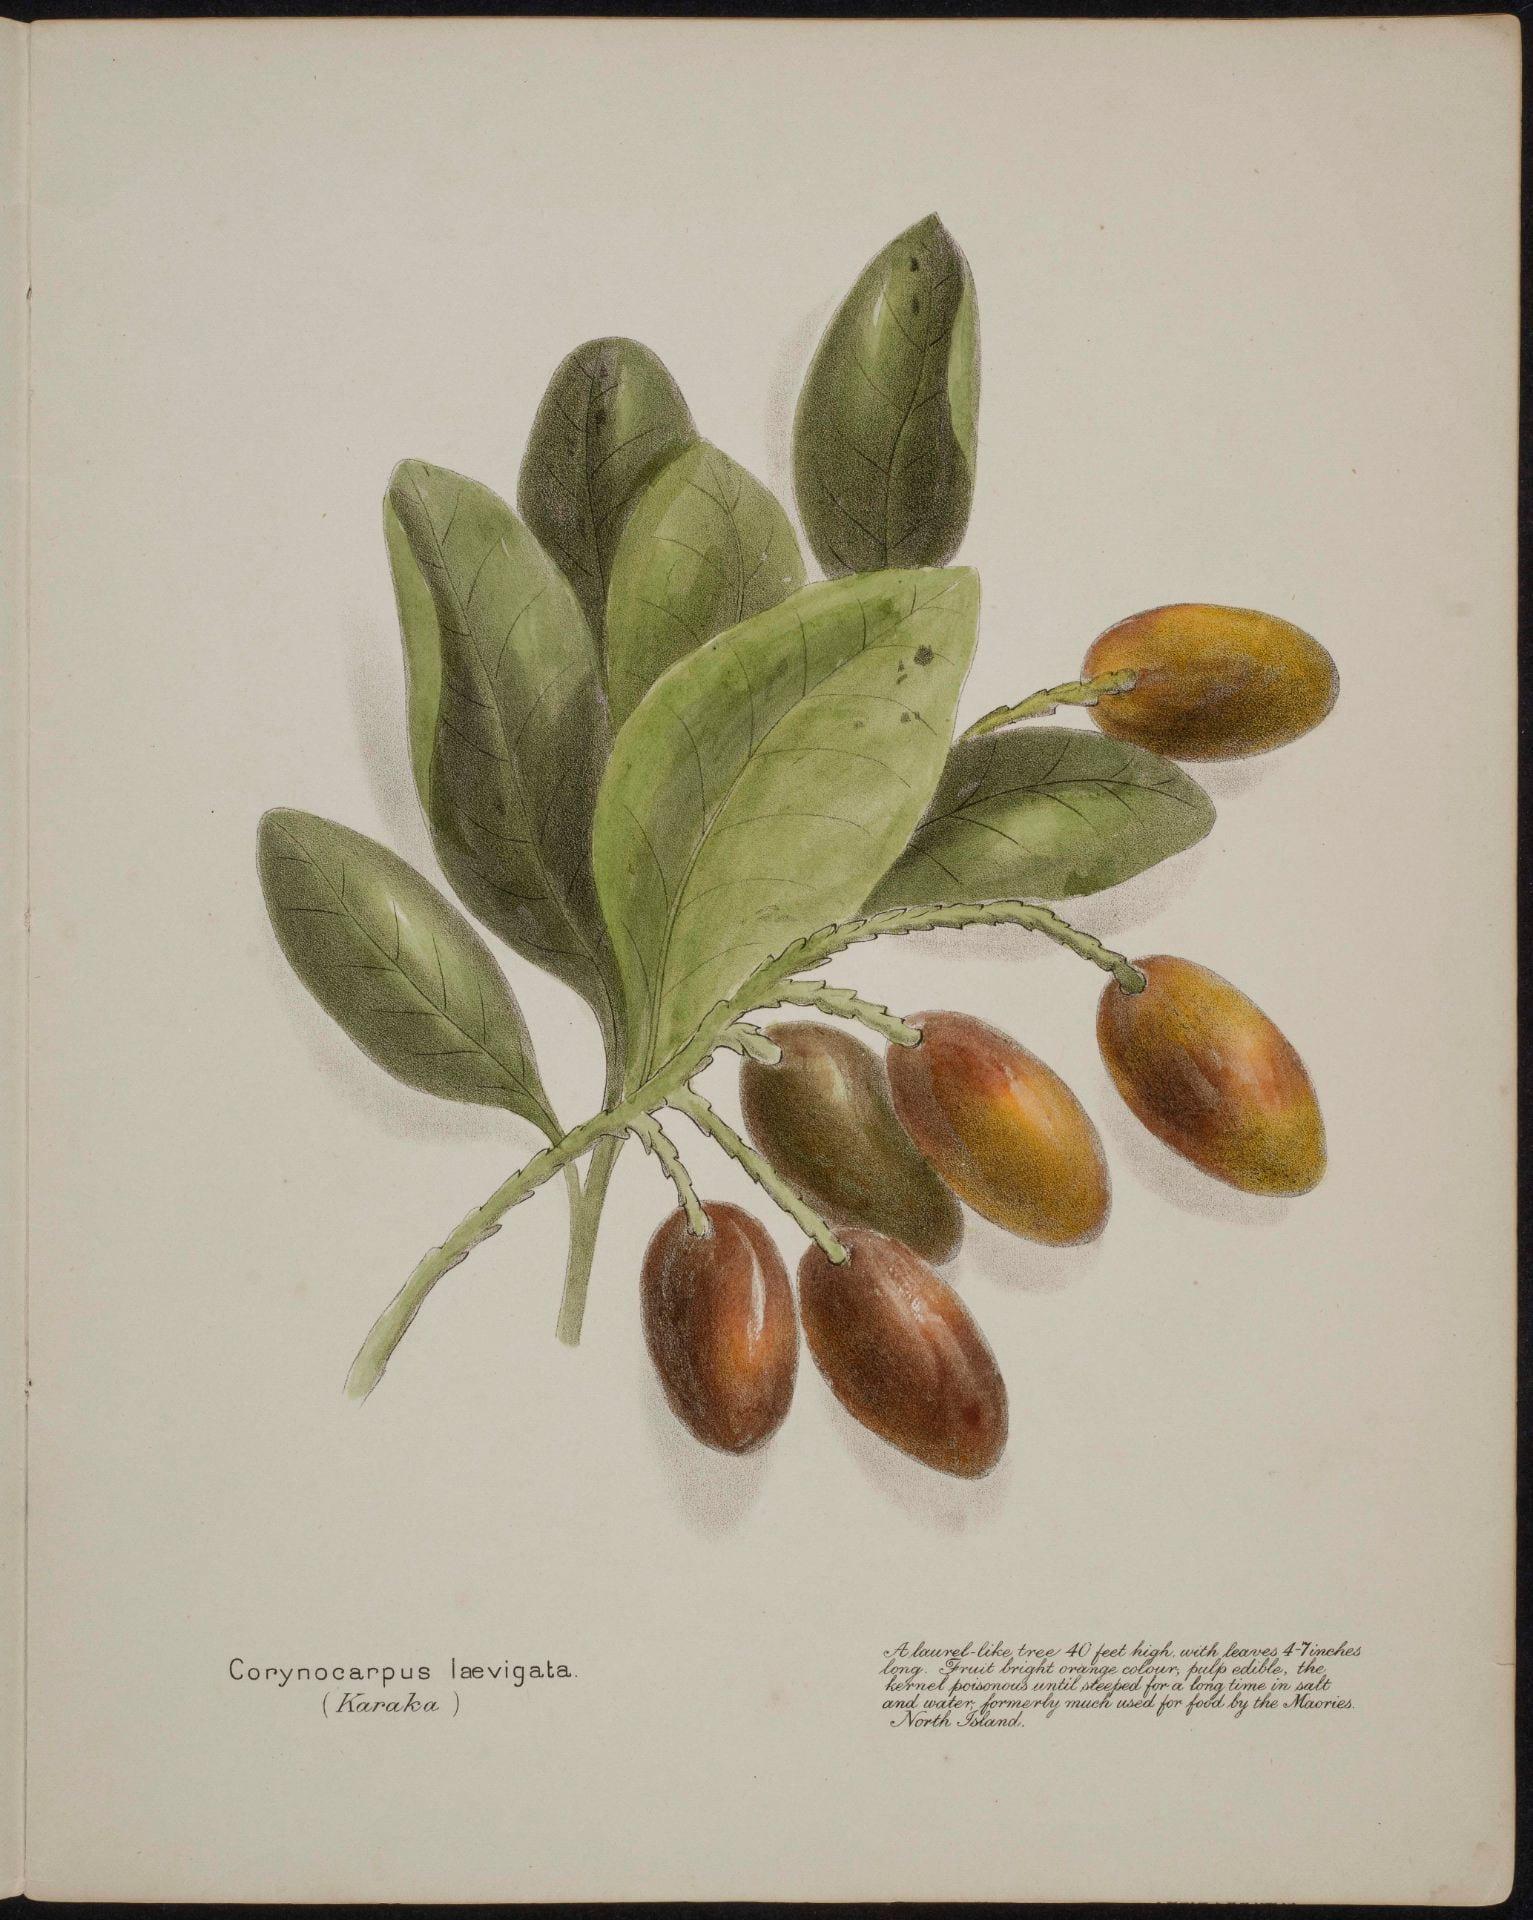 Corynocarpus laevigata Karaka